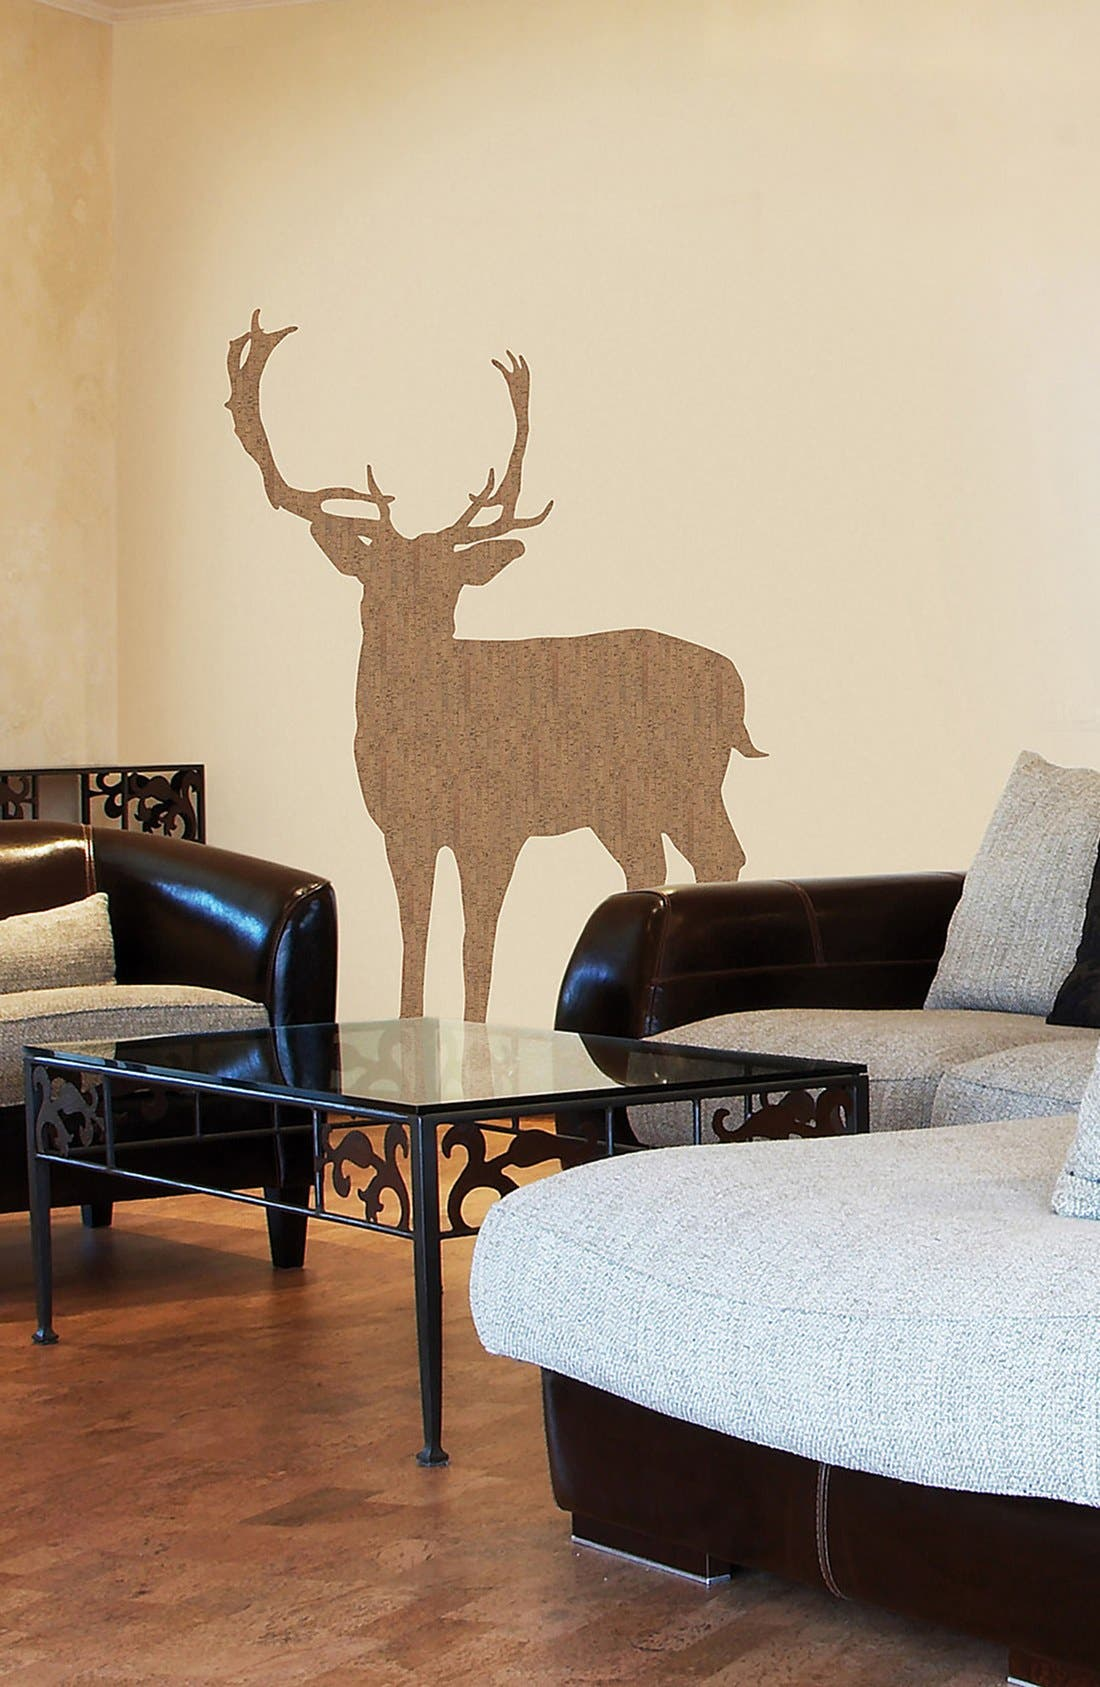 Alternate Image 1 Selected - Wallpops 'Deer' Cork Wall Art